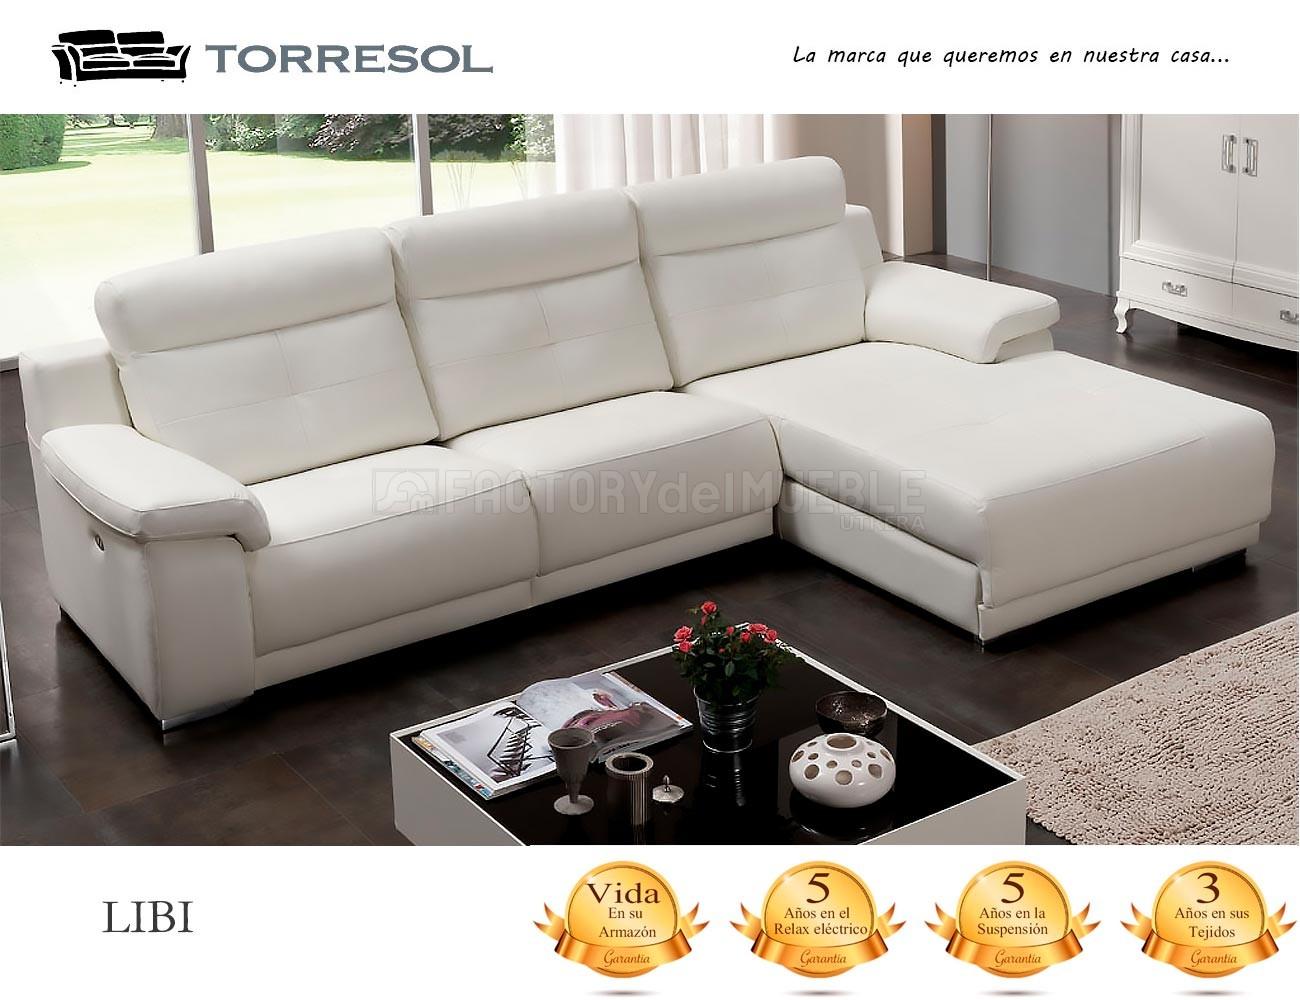 Sofa libi torresol en piel1